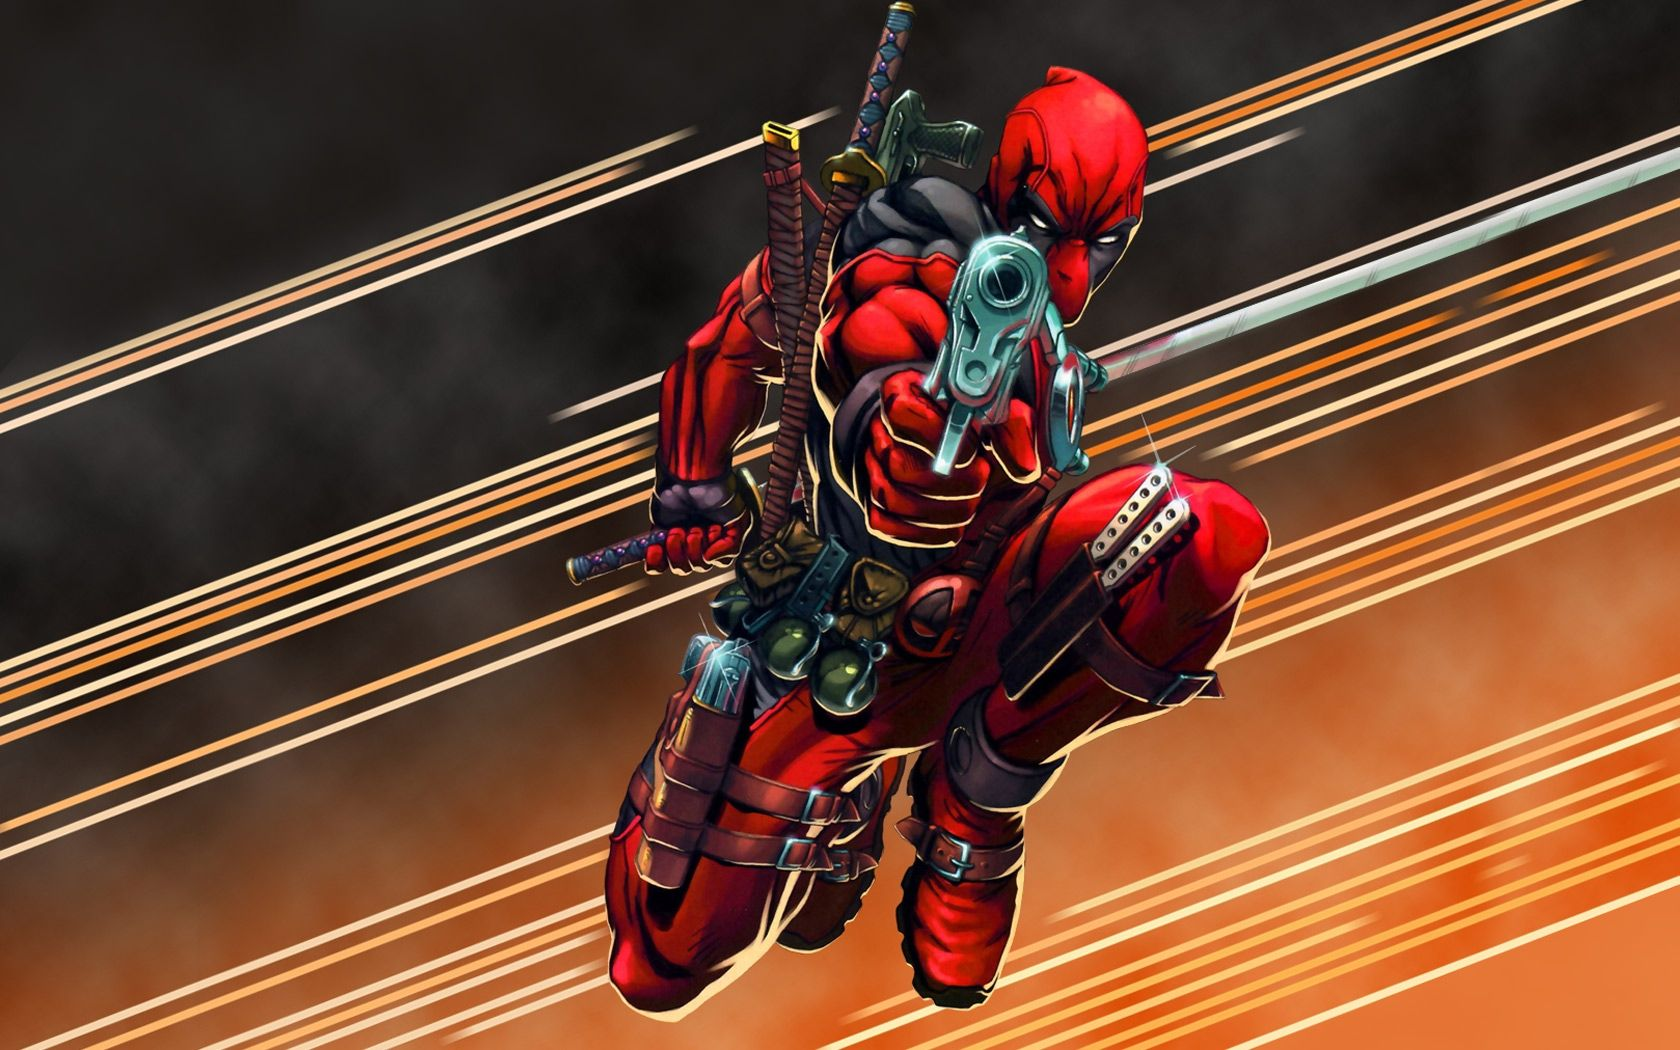 Ultimate Deadpool Wallpapers - Top Free Ultimate Deadpool